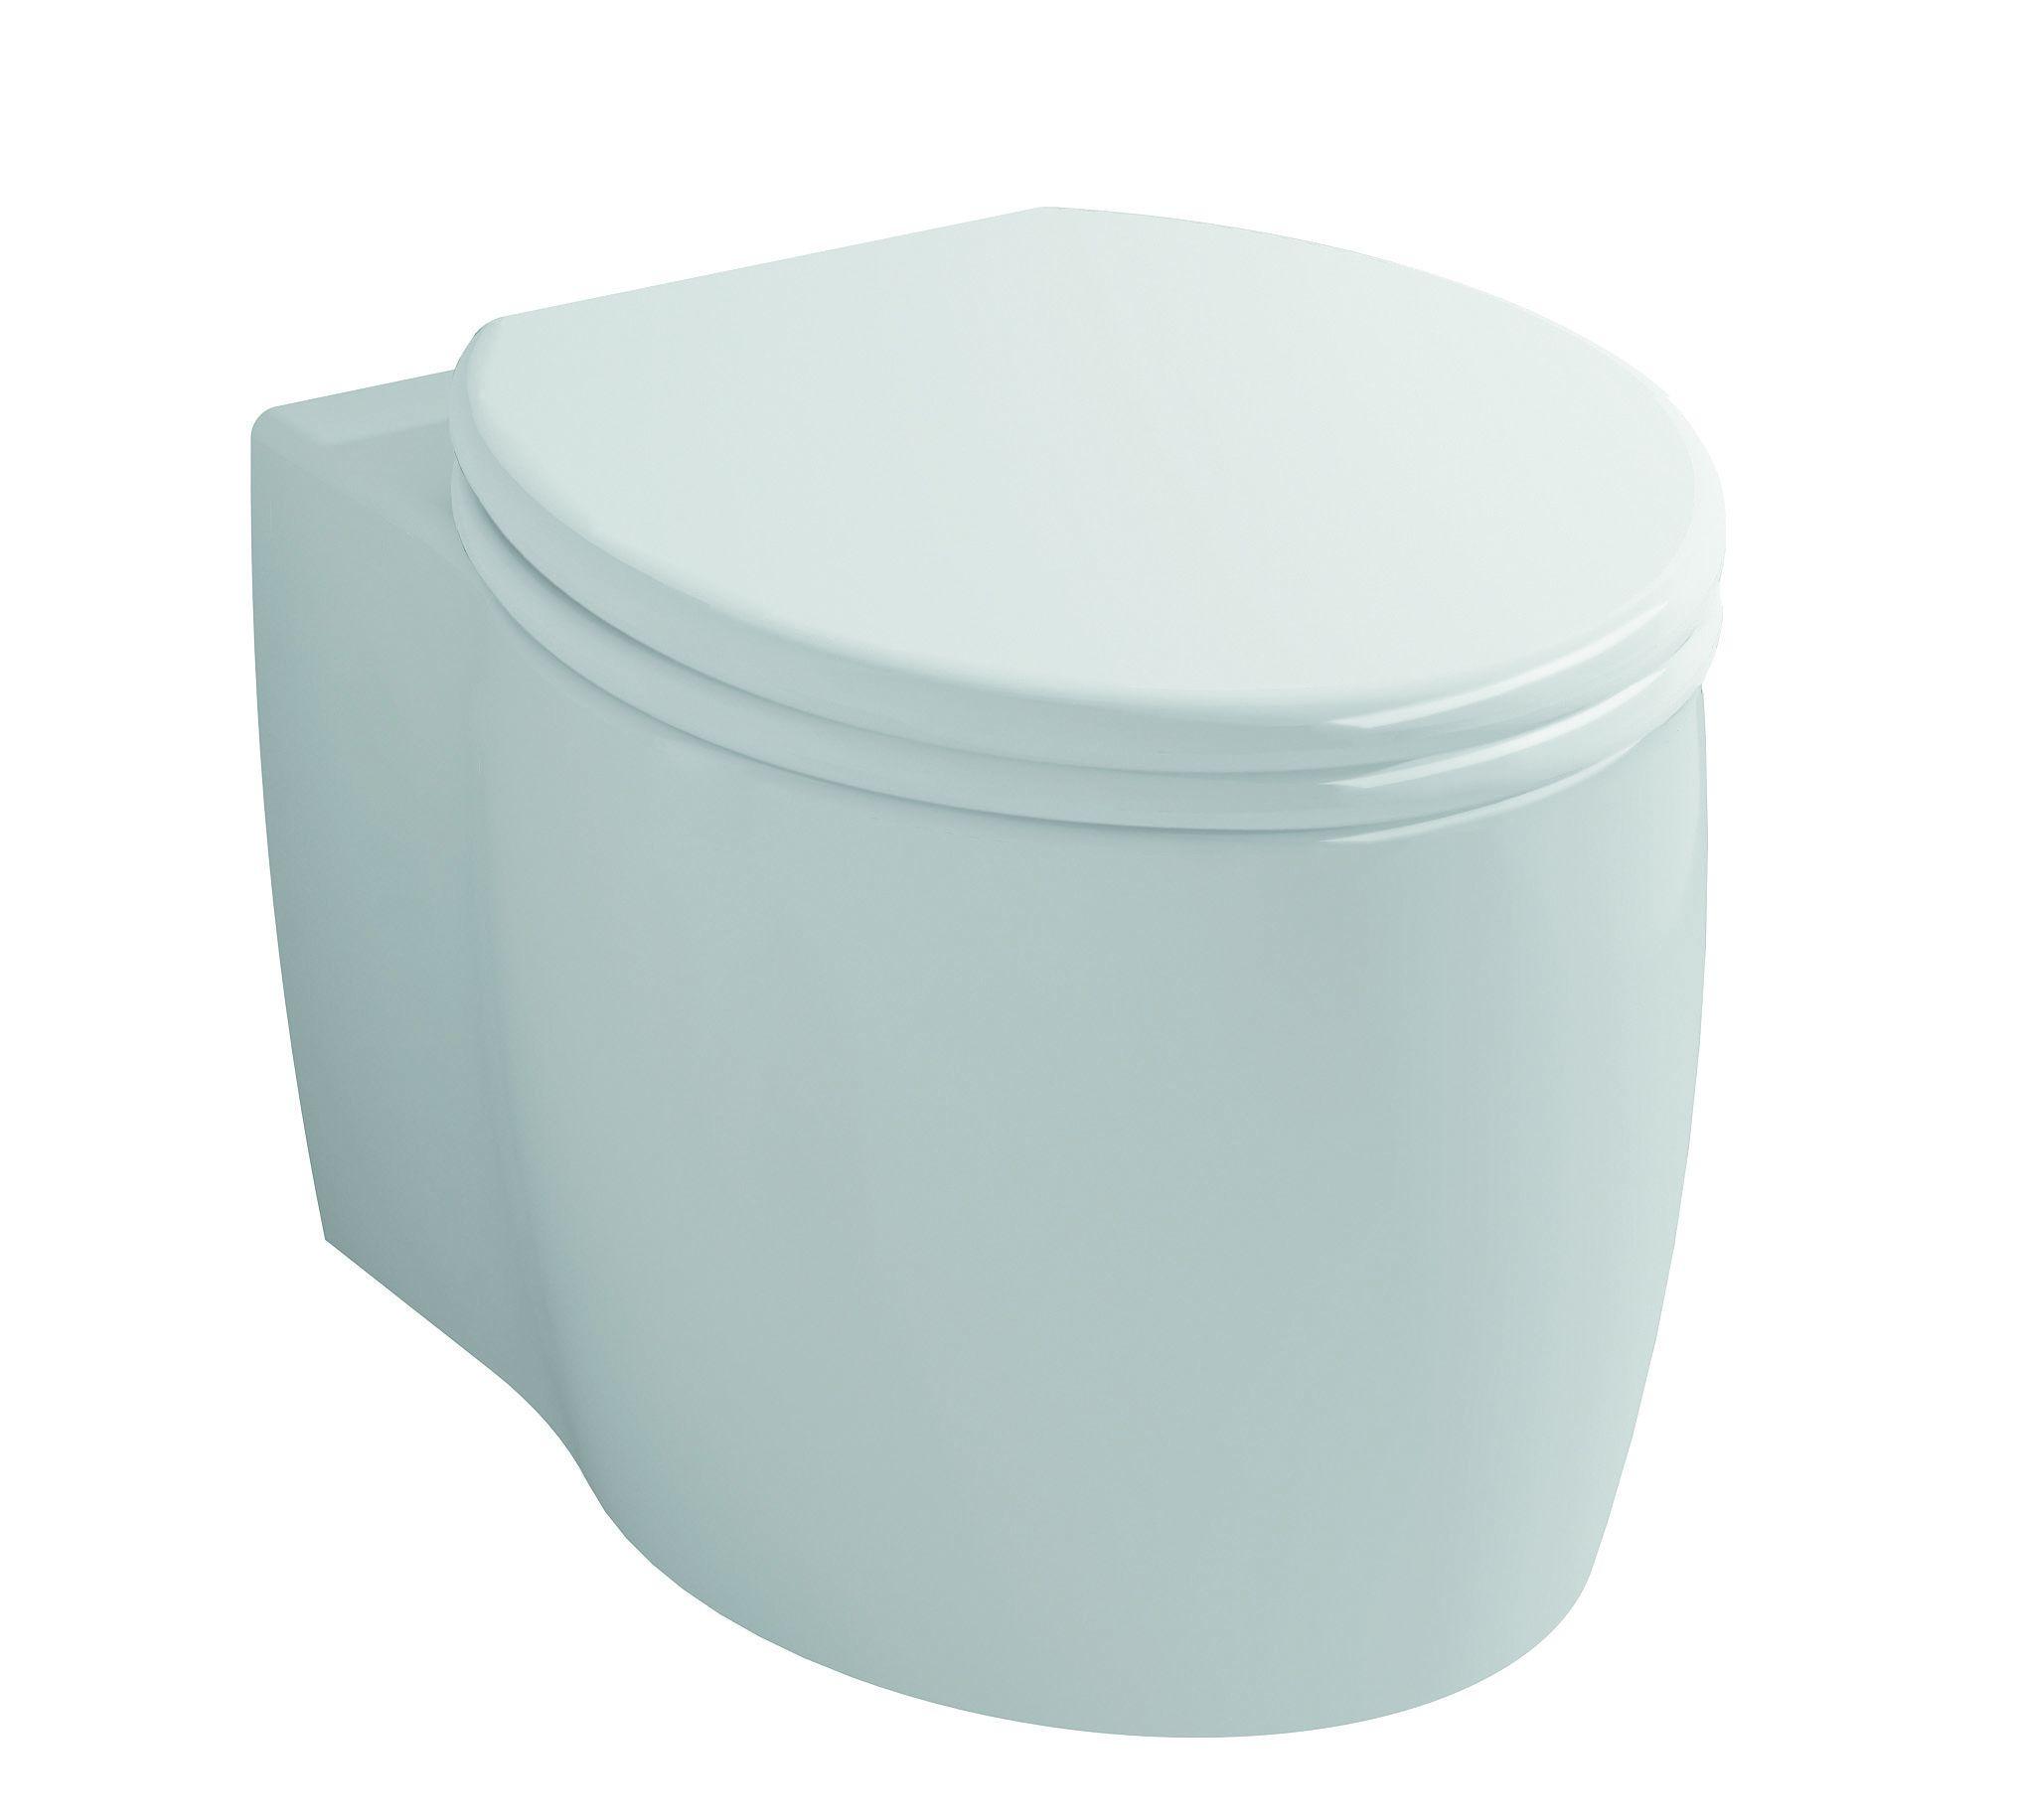 wand wc inkl soft close sitz wh 6030 glasdeals. Black Bedroom Furniture Sets. Home Design Ideas